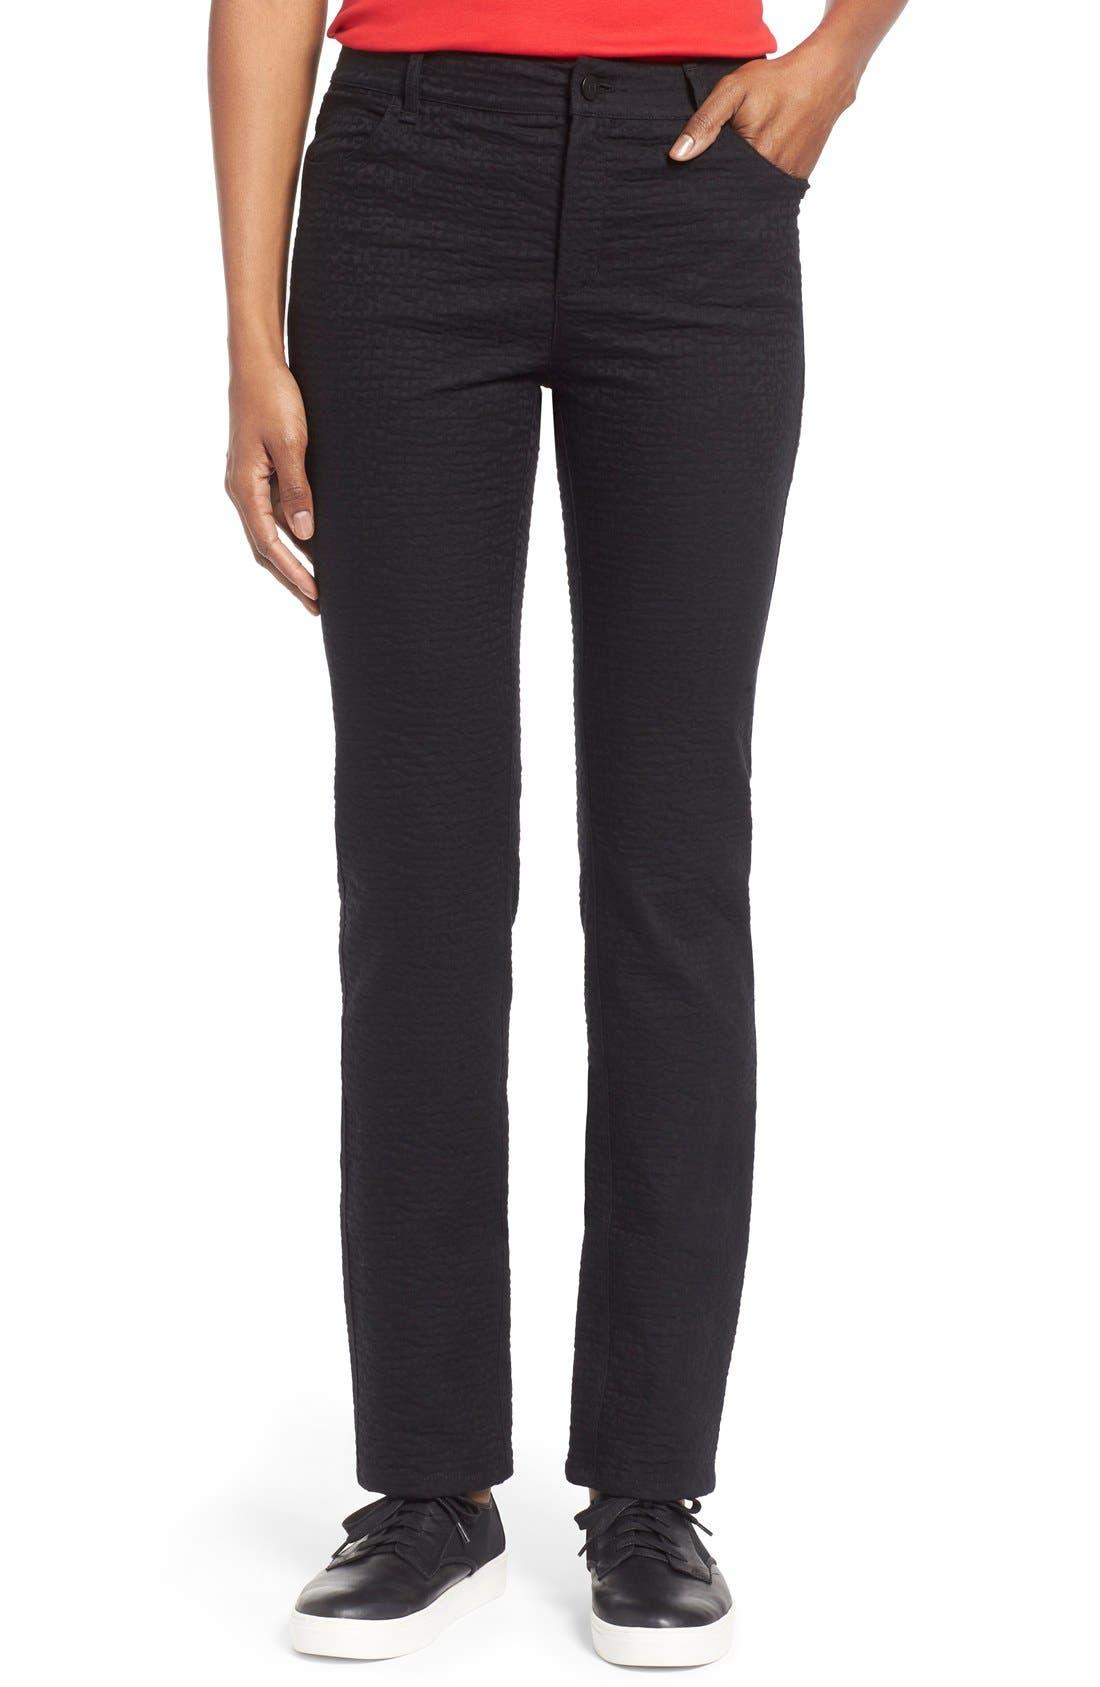 Alternate Image 1 Selected - Lafayette 148 New York Curvy Fit Jacquard Stretch Slim Leg Jeans (Black) (Regular & Petite)